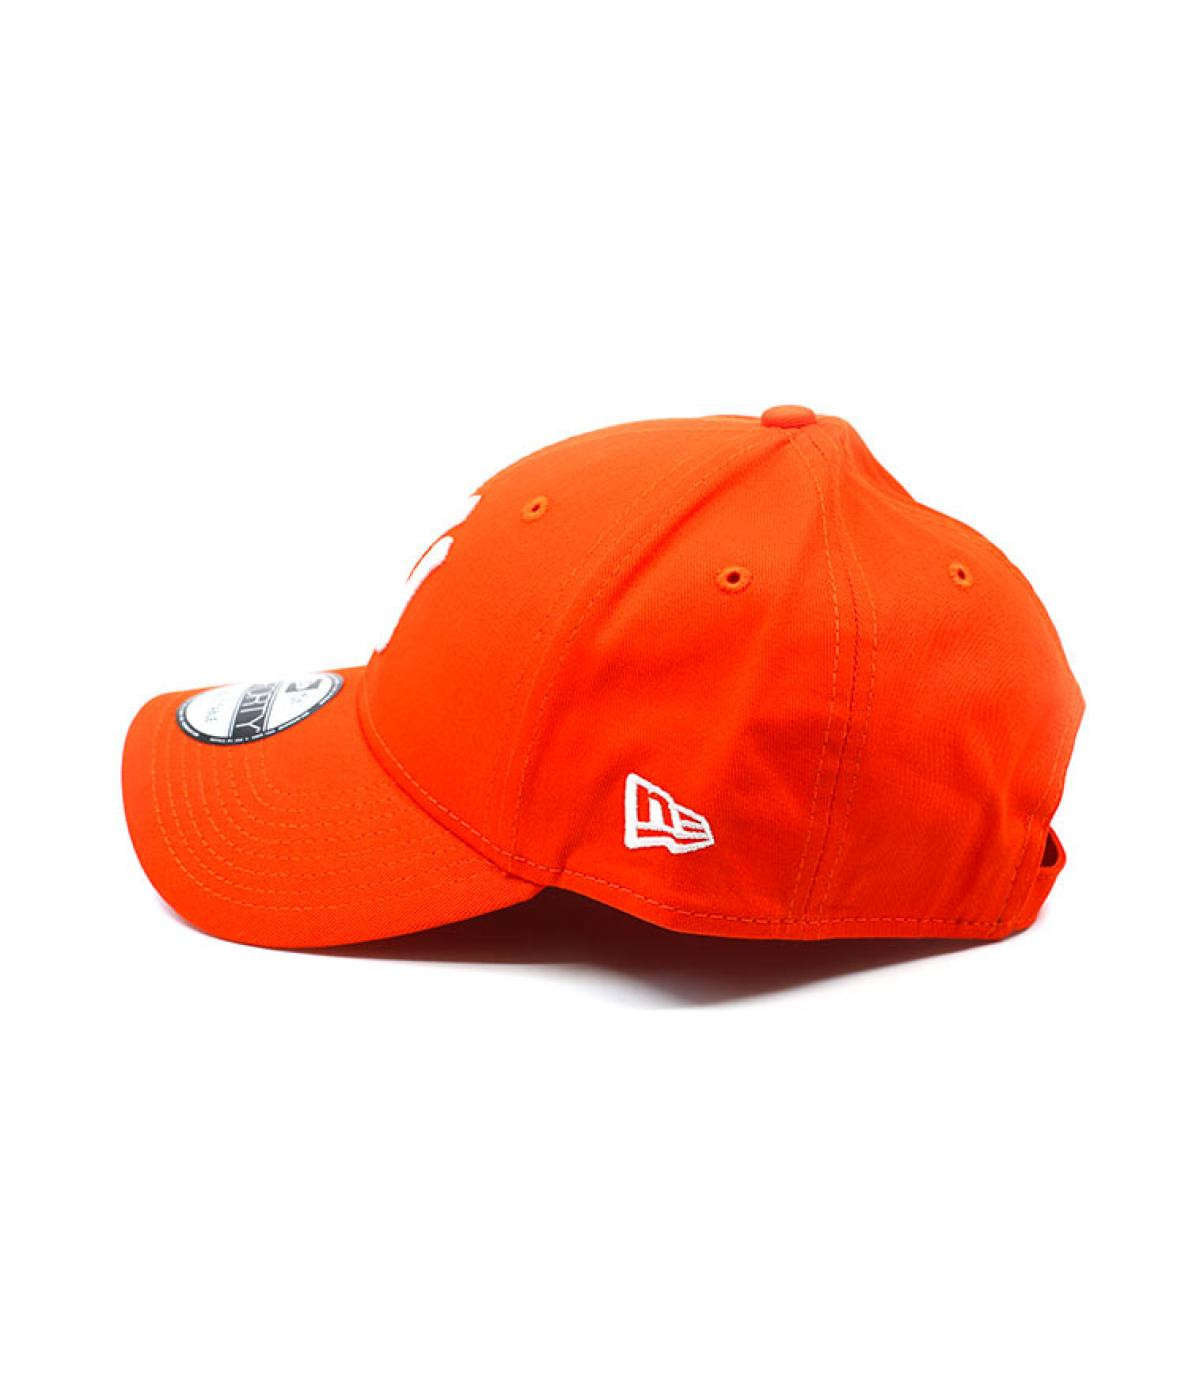 Details League Ess 9Forty NY orange - afbeeling 4